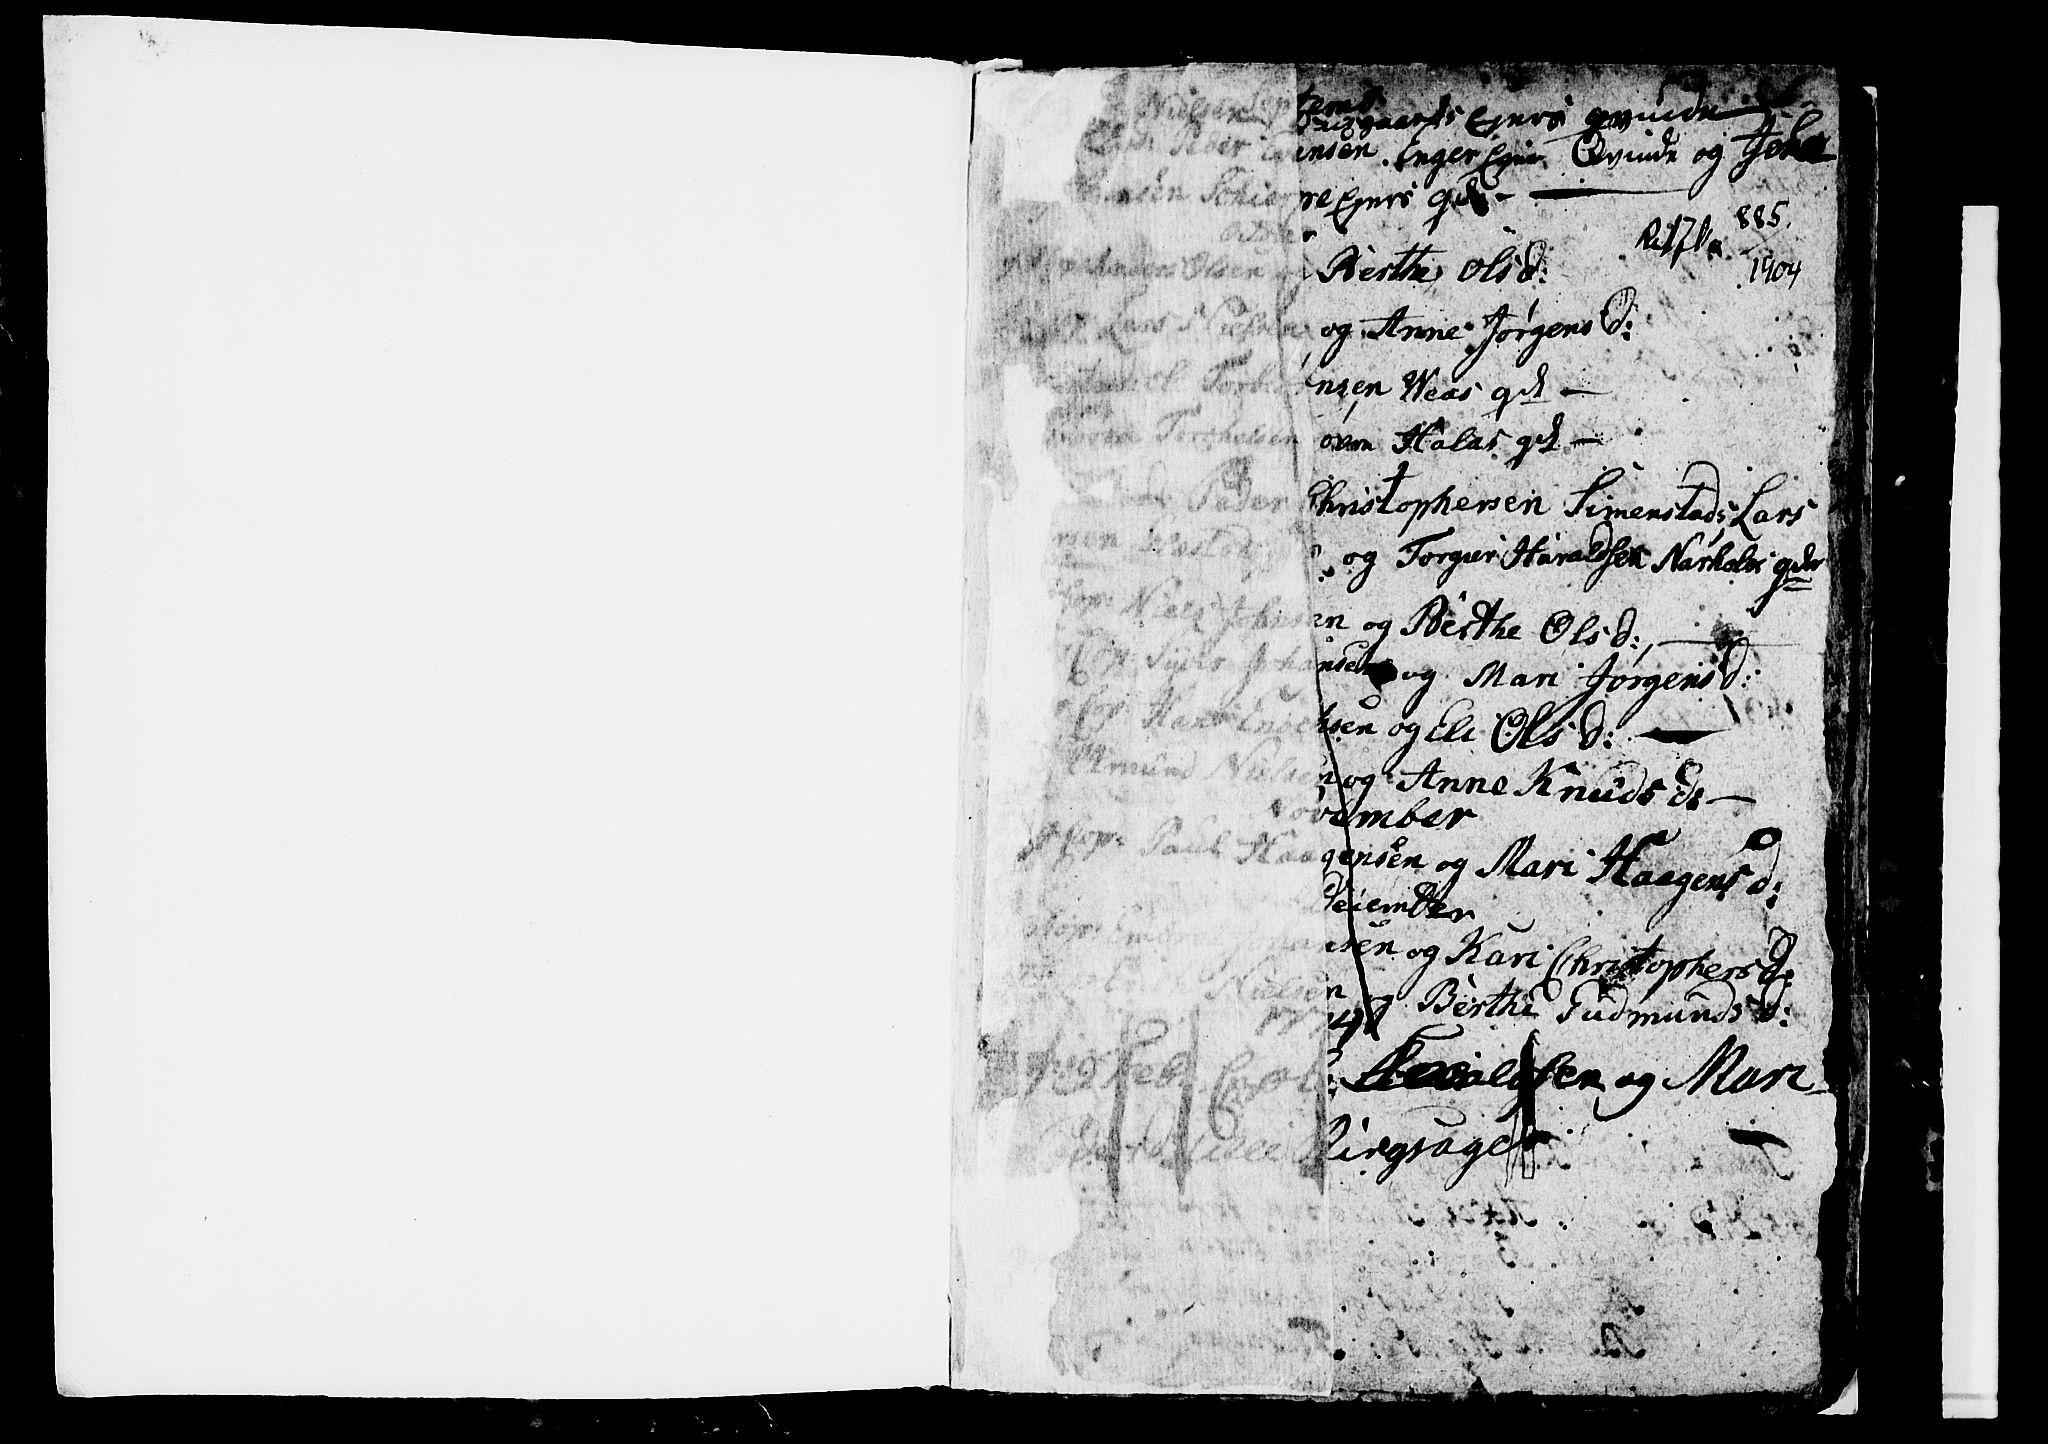 SAH, Ringsaker prestekontor, I/Ia/L0005/0001: Kladd til kirkebok nr. 1A, 1773-1775, s. 0-1